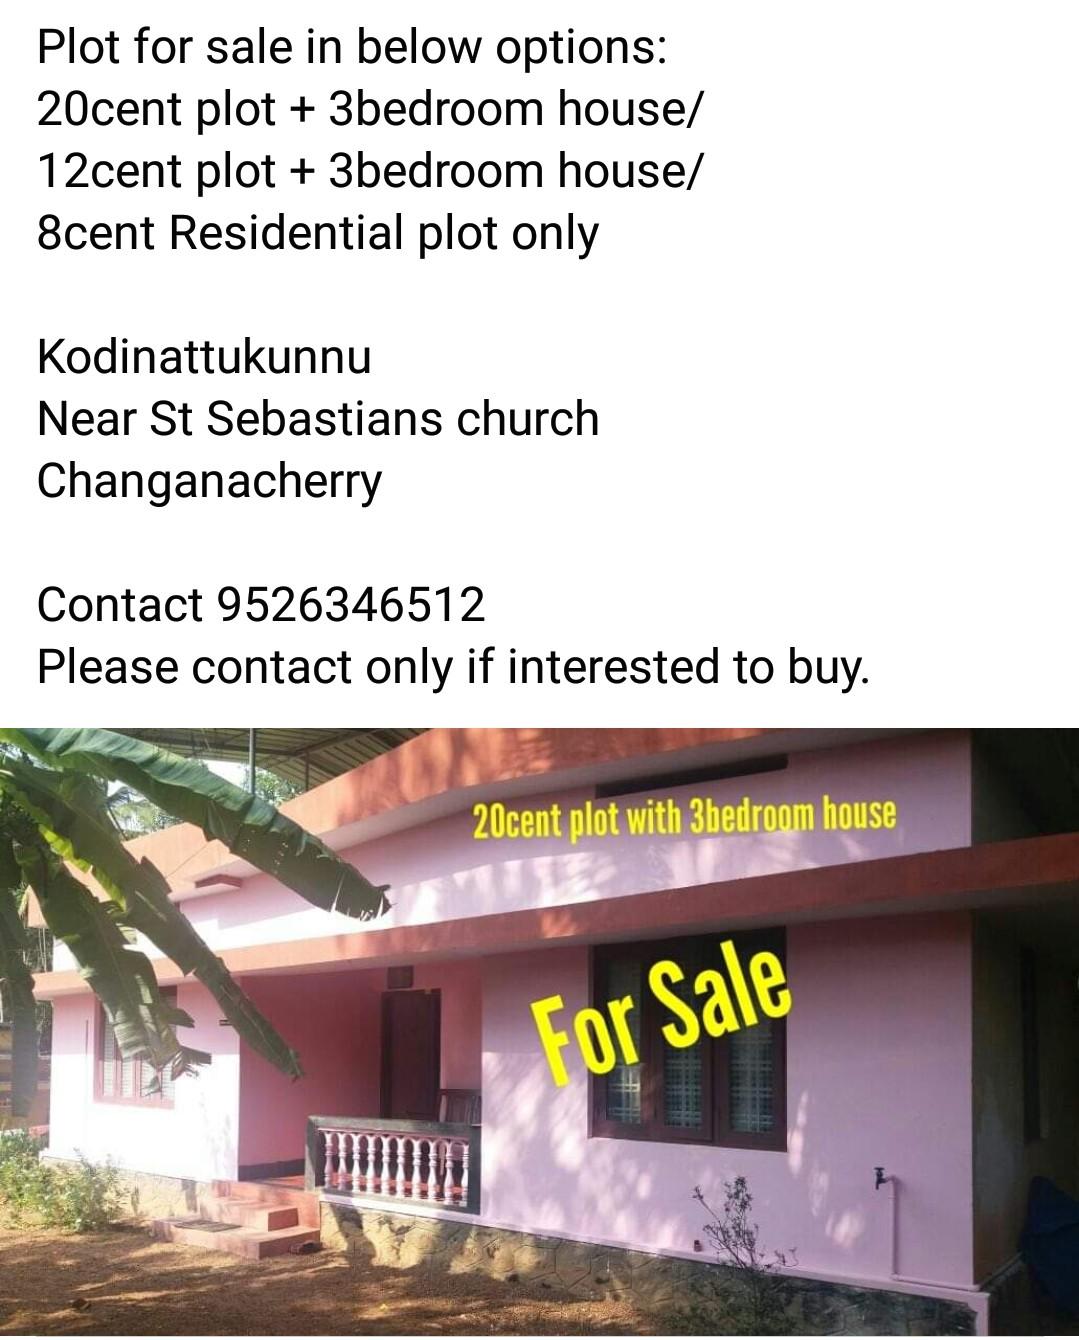 12 Cent Plot with  3 Bedroom House for Sale at Kodinattukunnu, Changanacherry